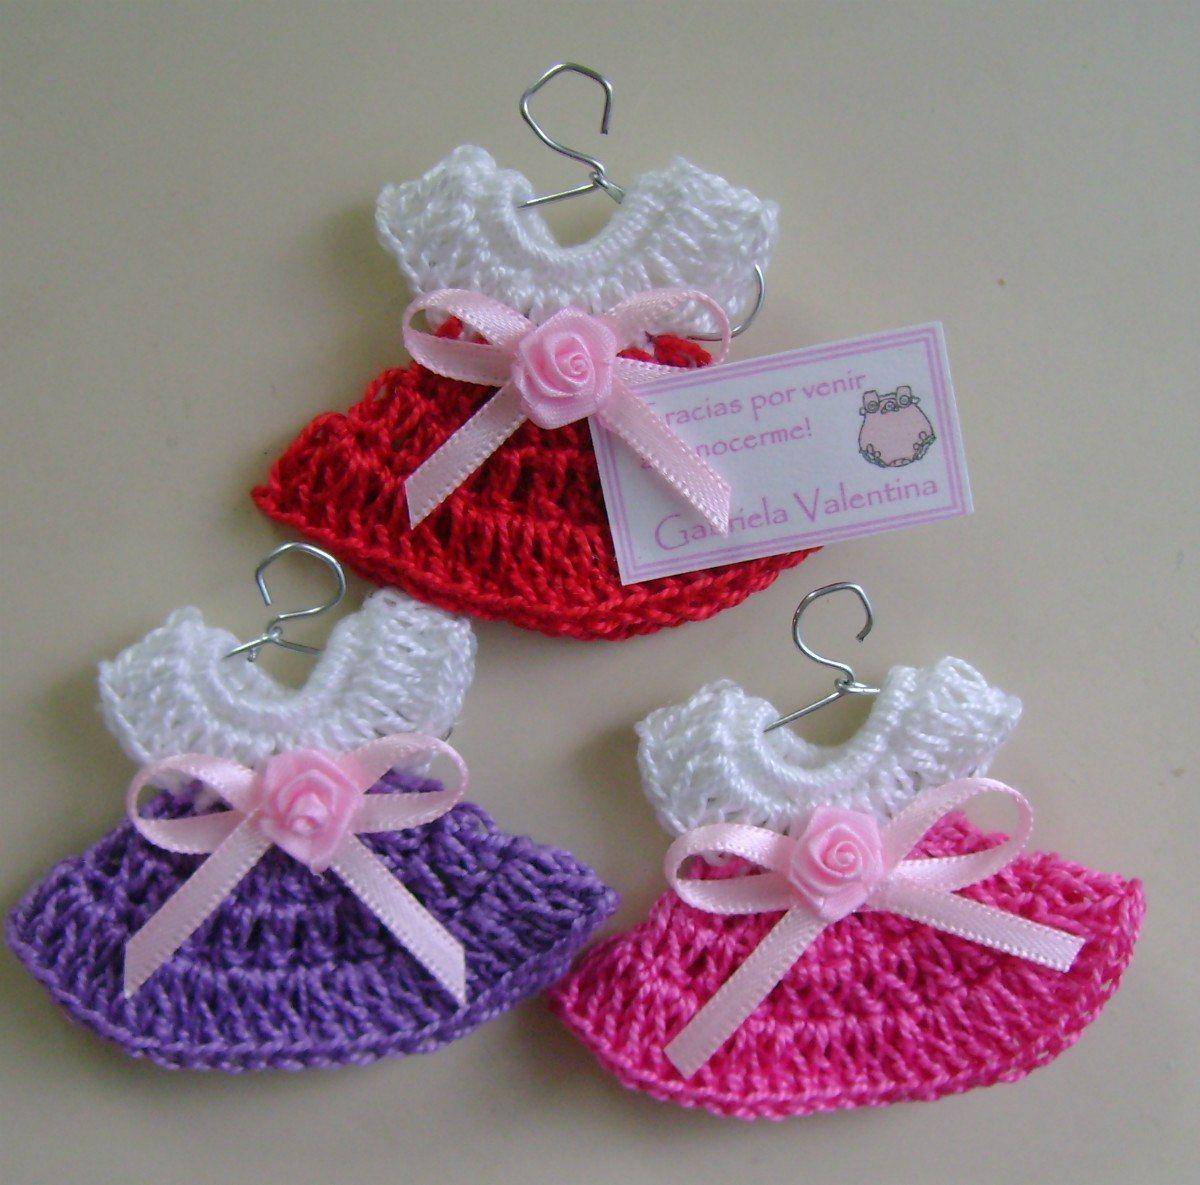 Recuerdos para baby shower a crochet (13)